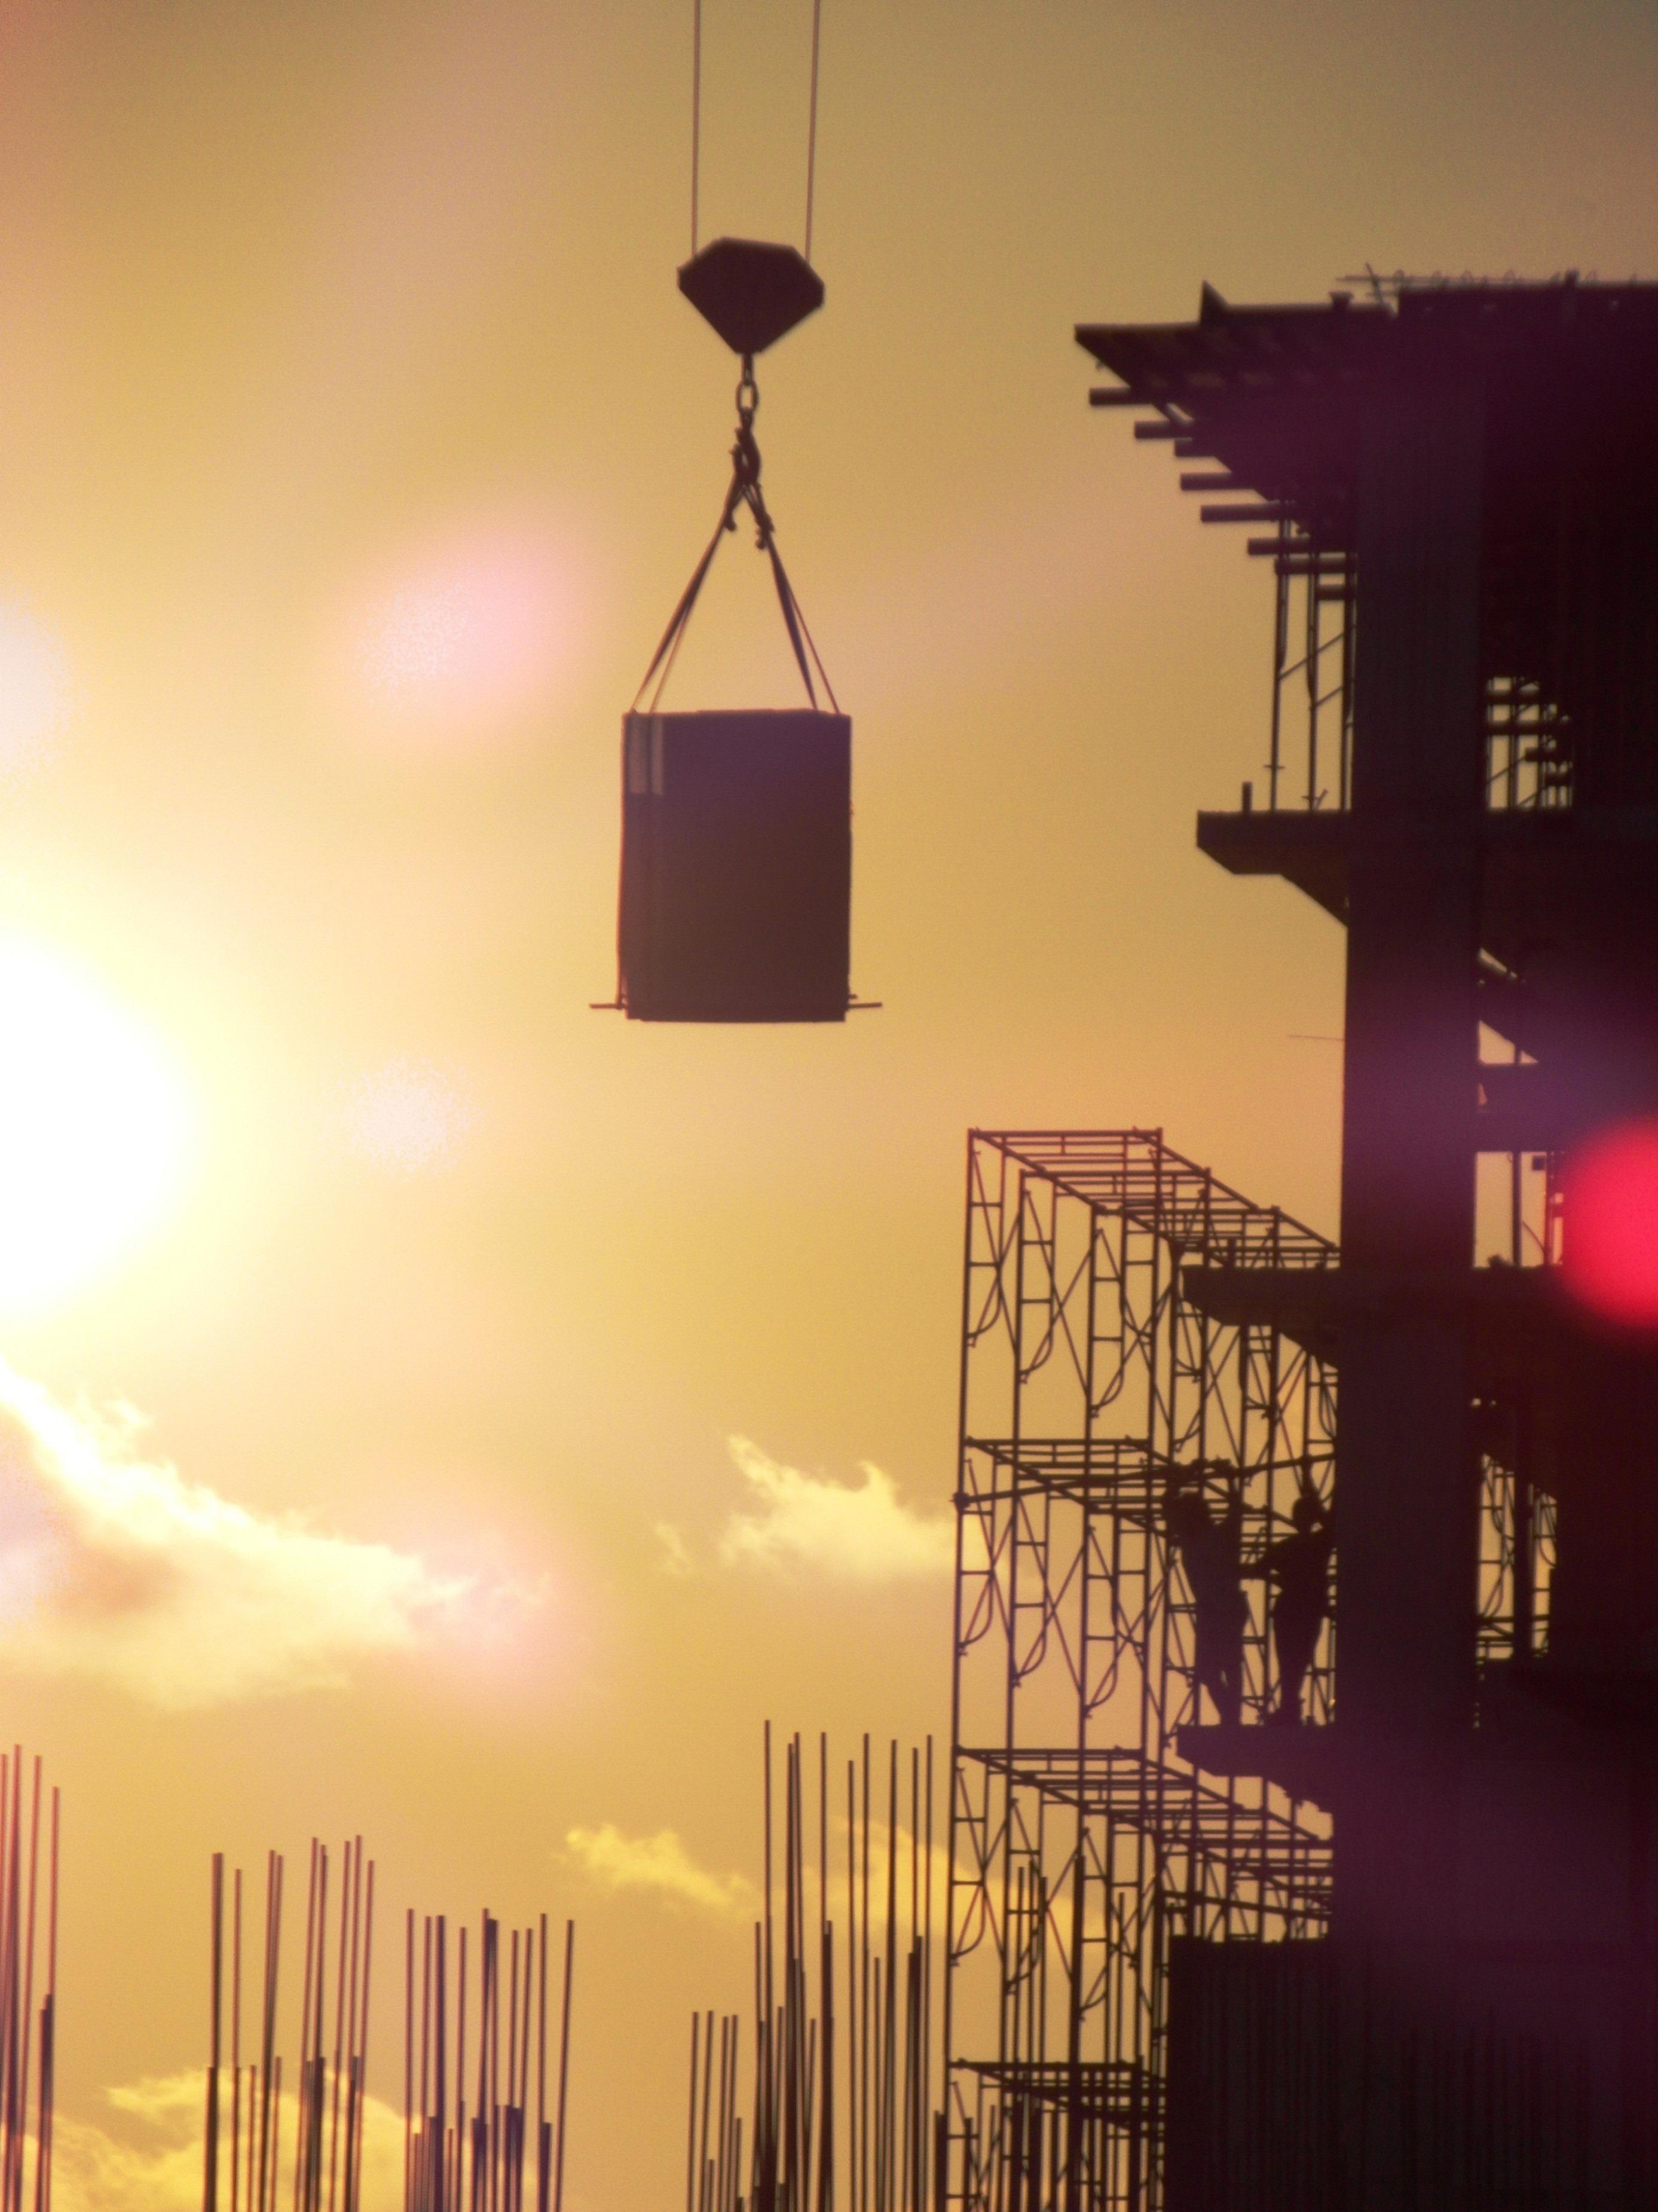 Construction Silhouette, Activity, Site, Large, Lift, HQ Photo